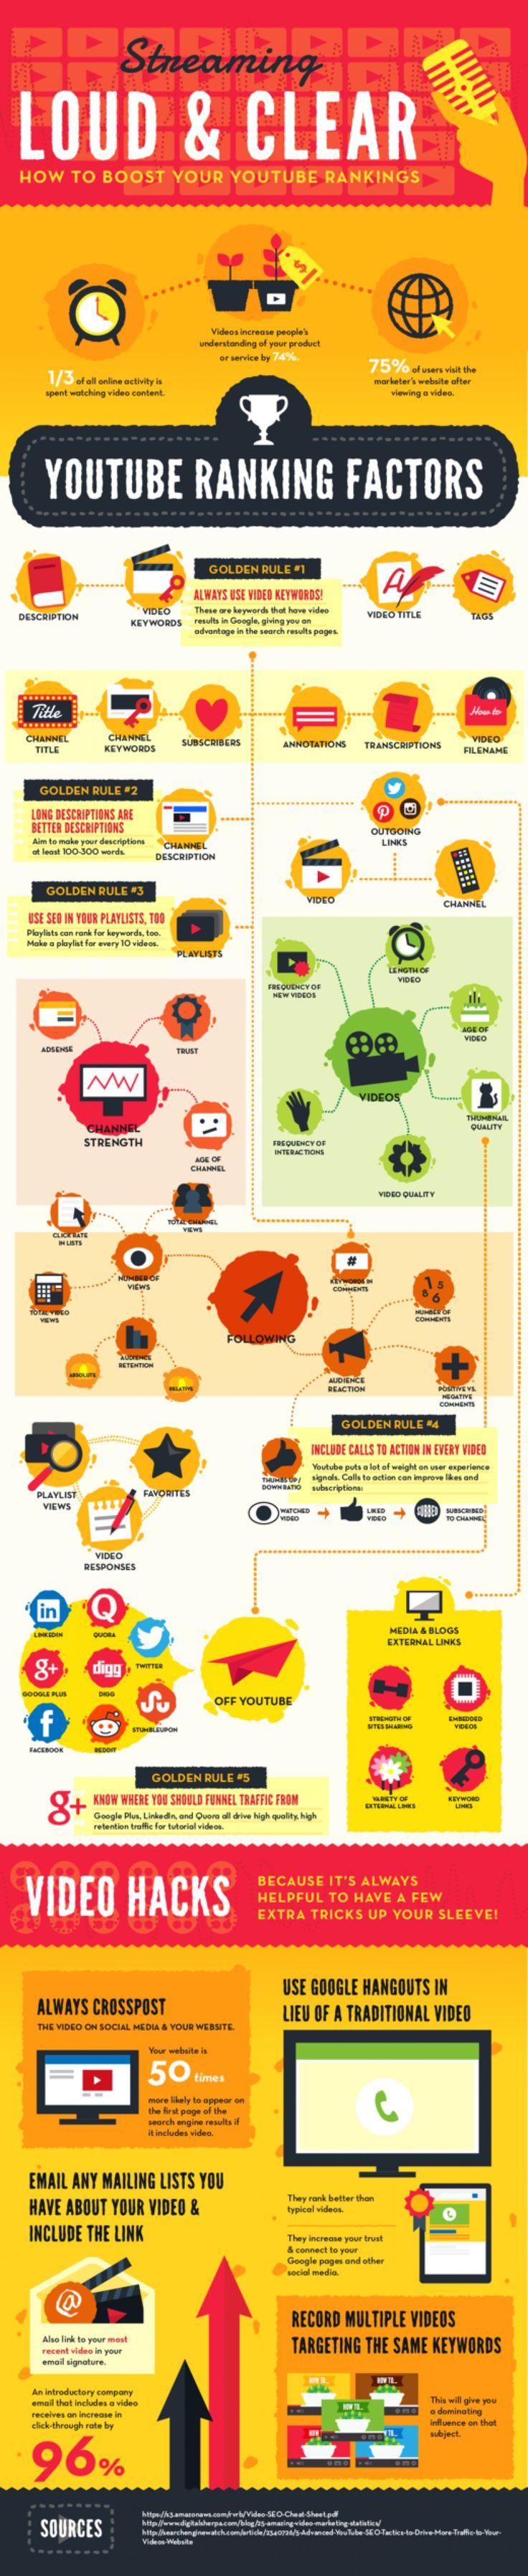 How To Boost Your Youtube Rankings #infographic www.rubendelaosa.com #youtube @rubendelaosa